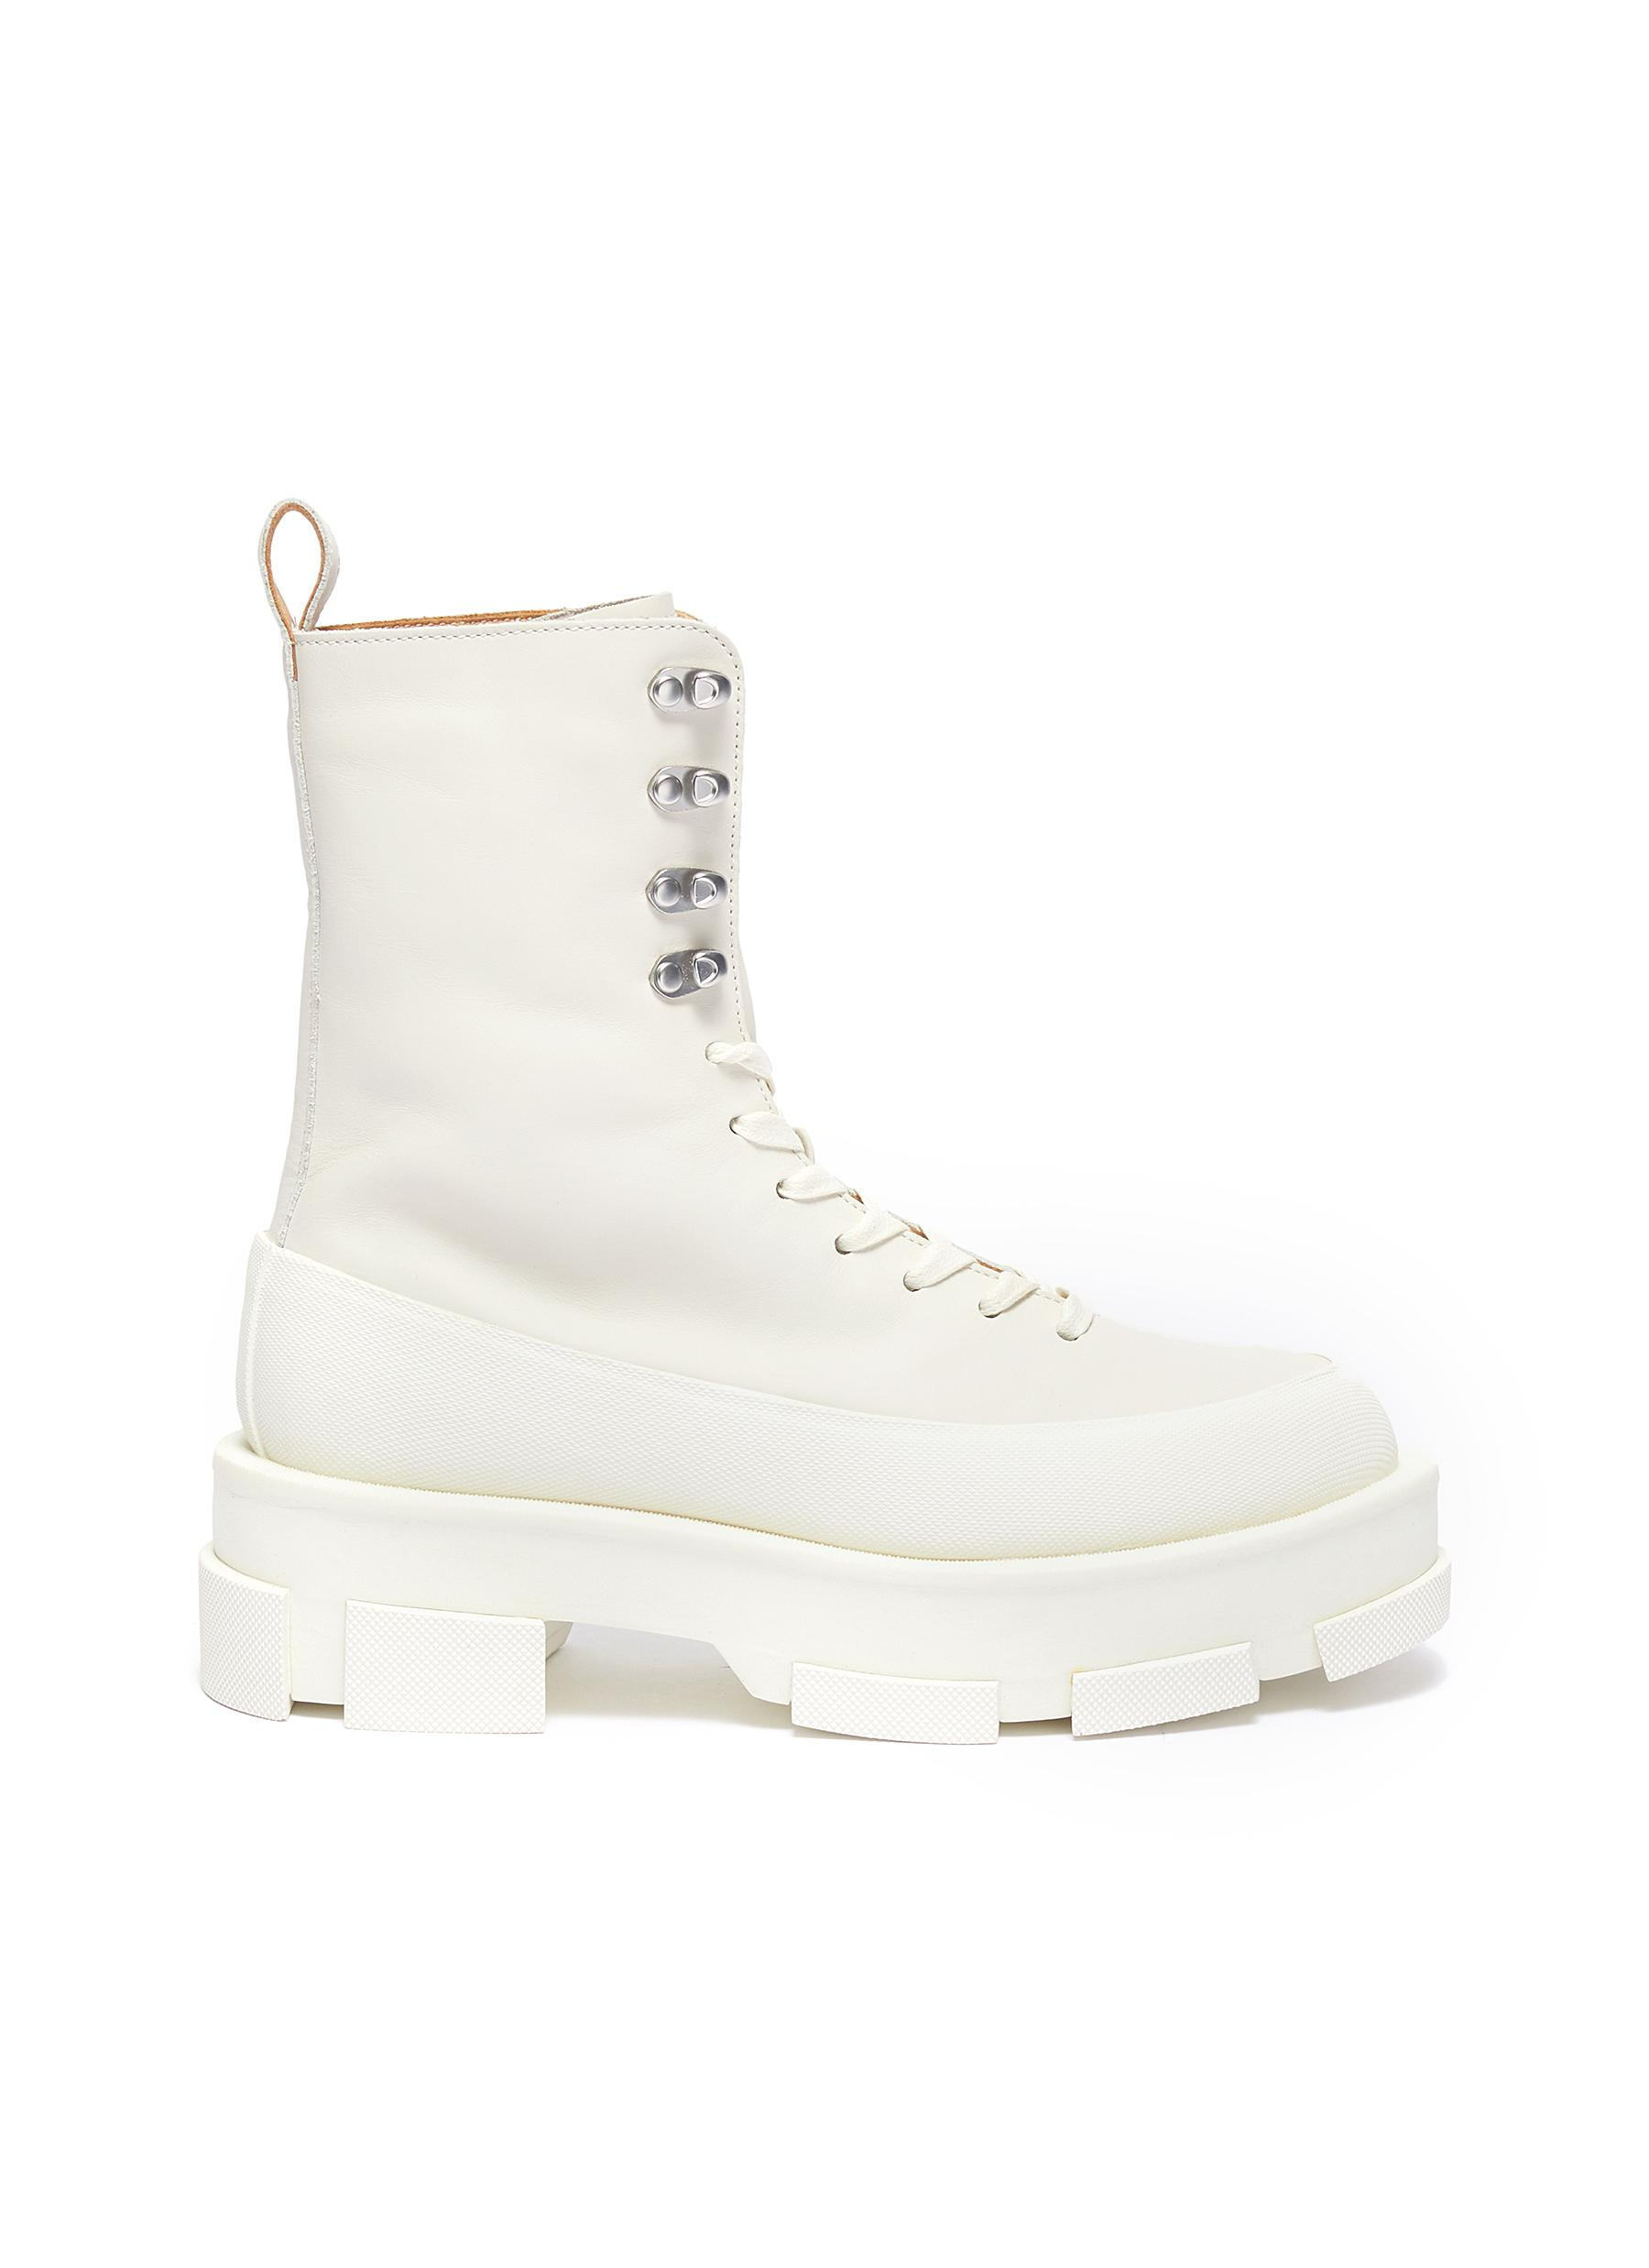 Gao' leather platform combat boots